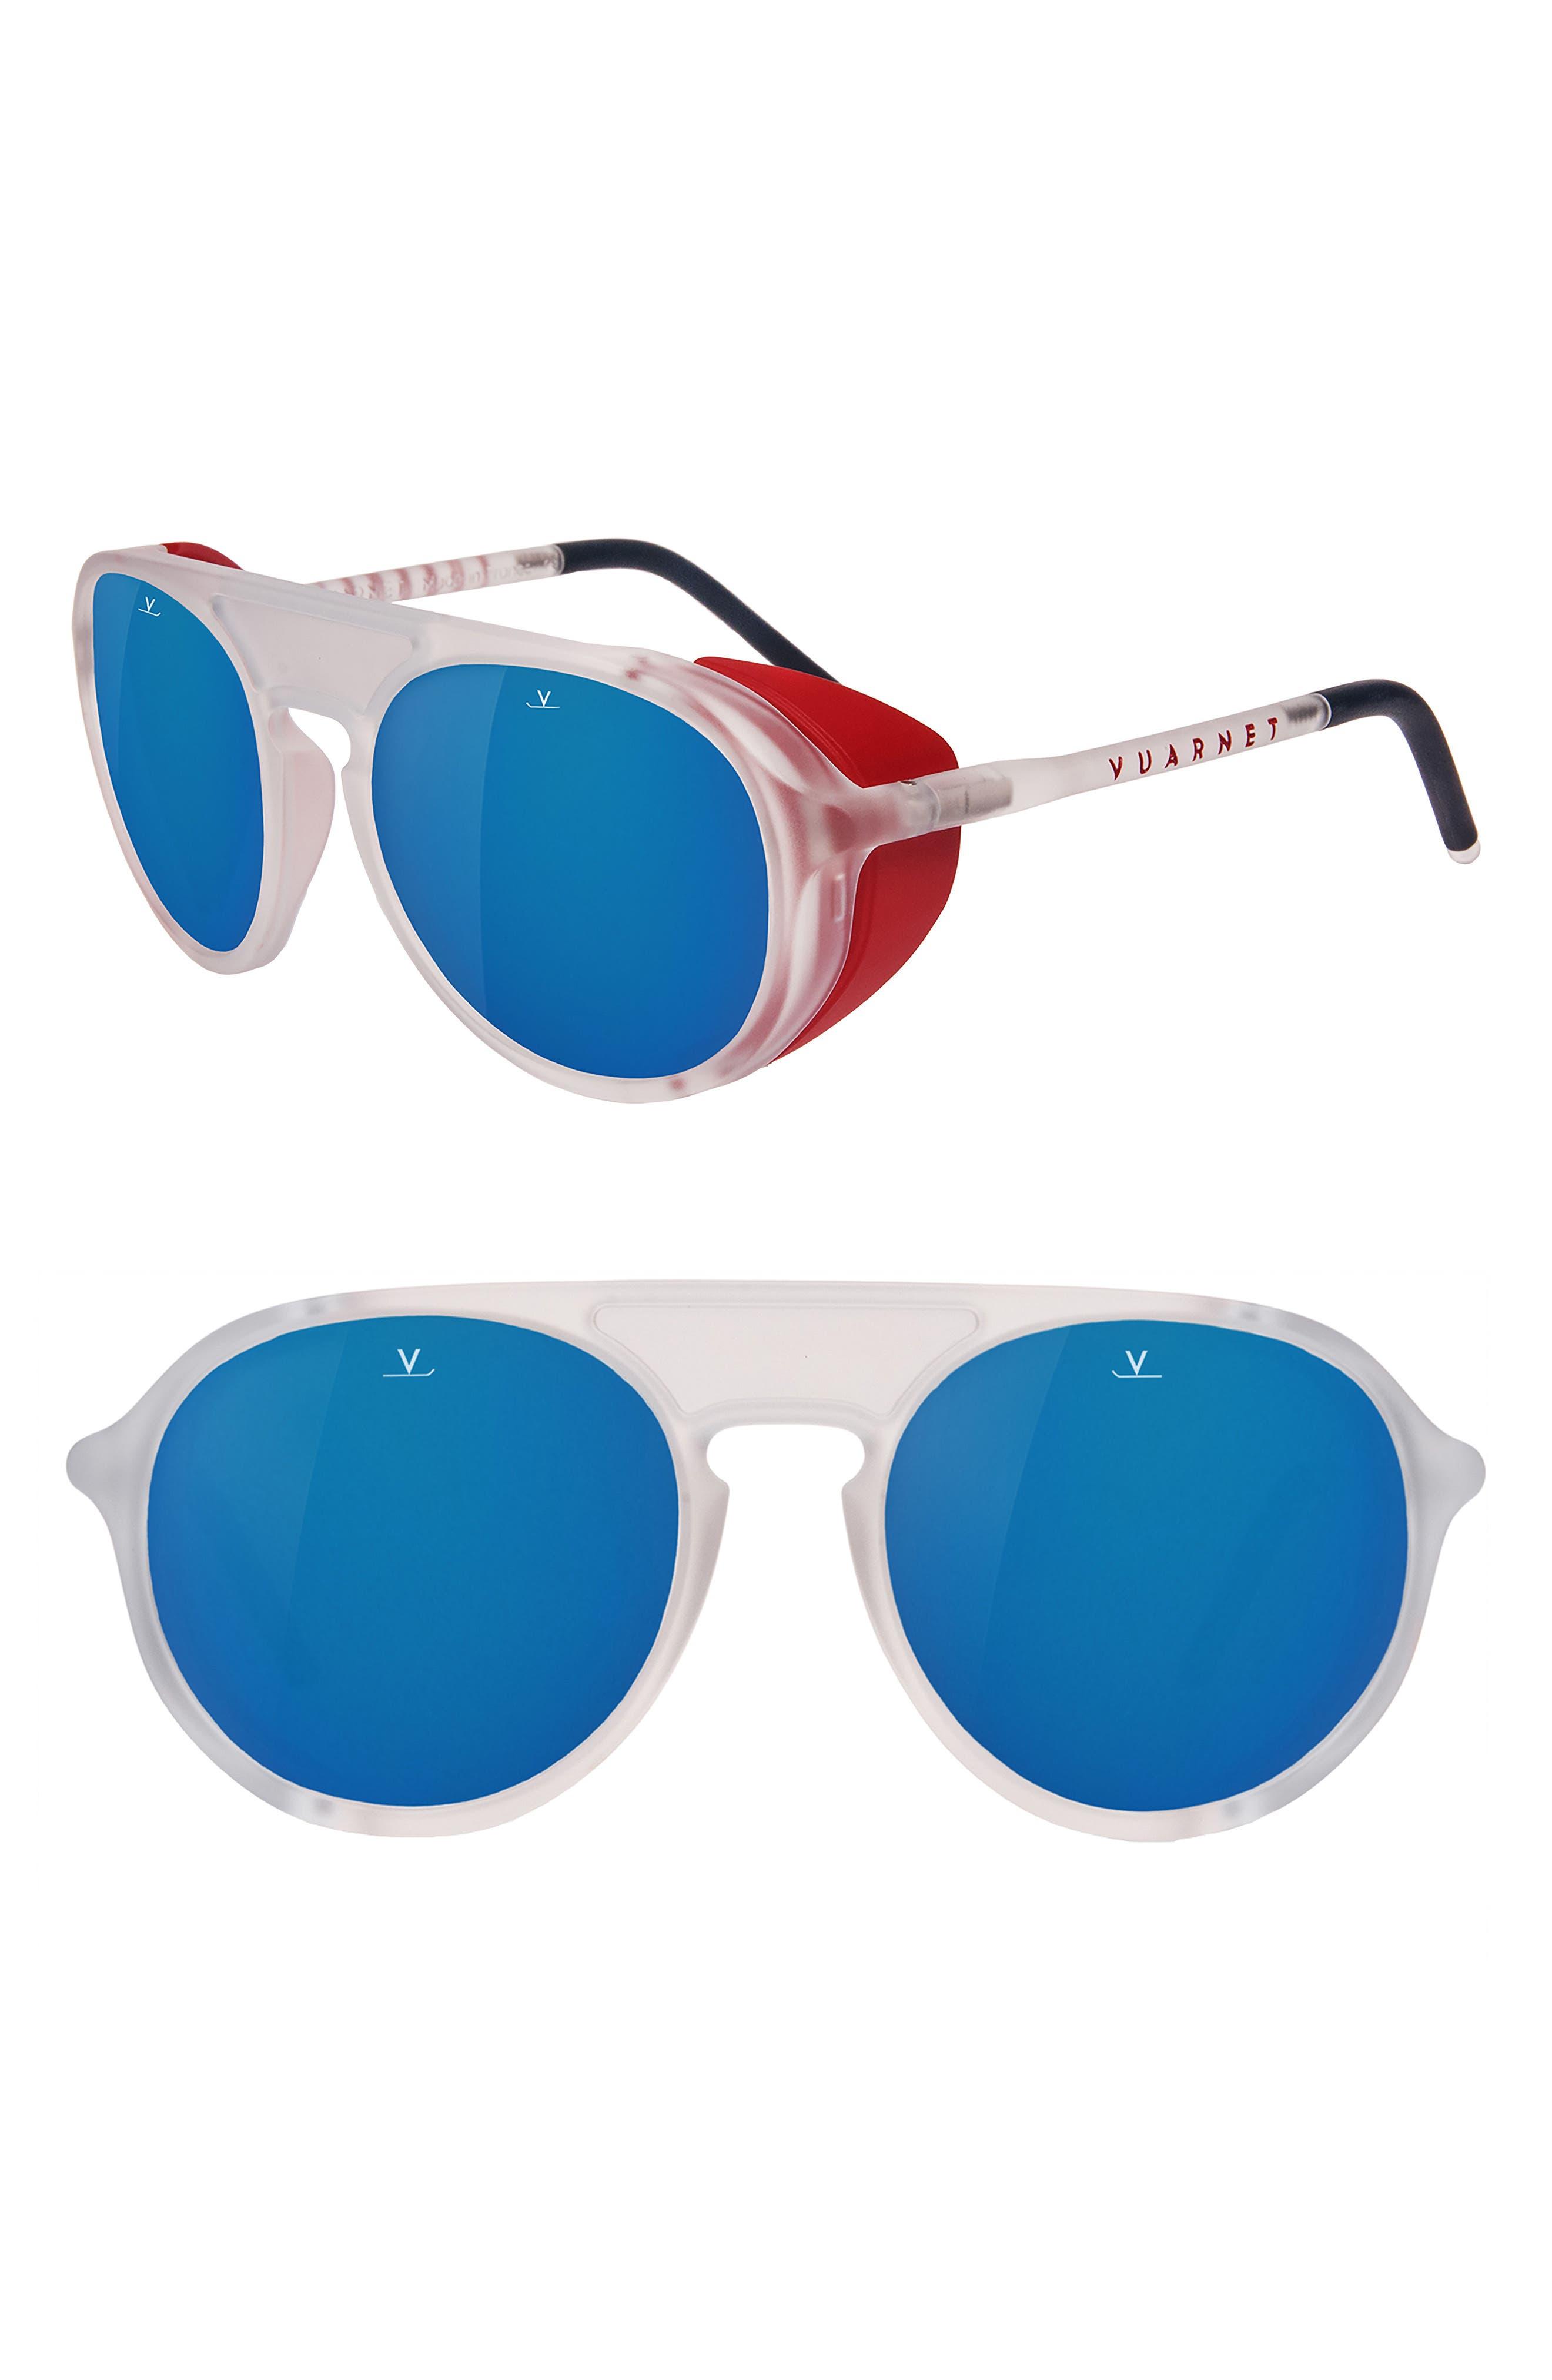 Ice 51mm Polarized Aviator Sunglasses,                         Main,                         color, GREY POLAR BLUE FLASH